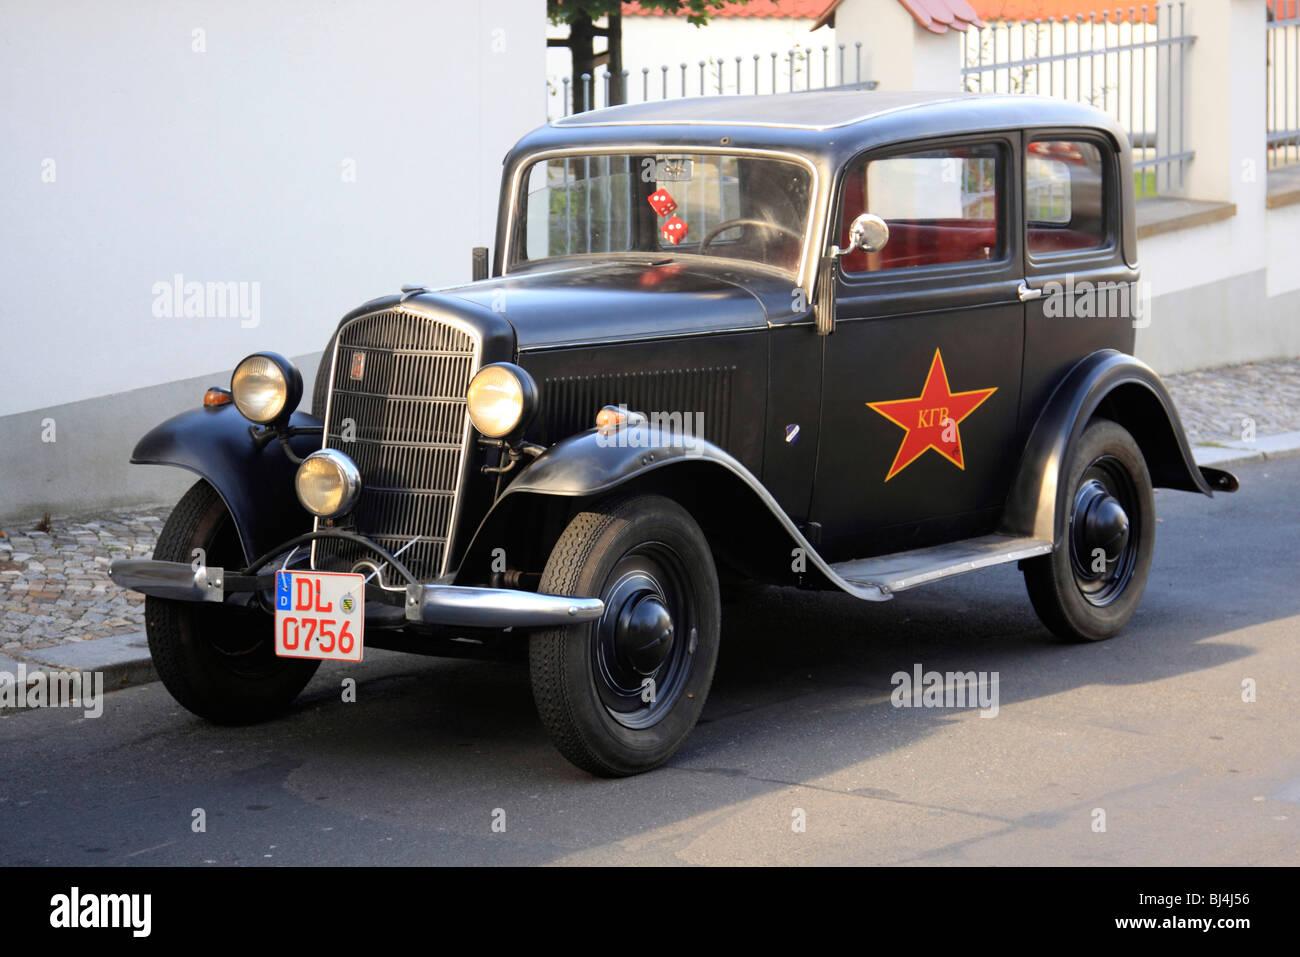 Vintage car, KGB car - Stock Image